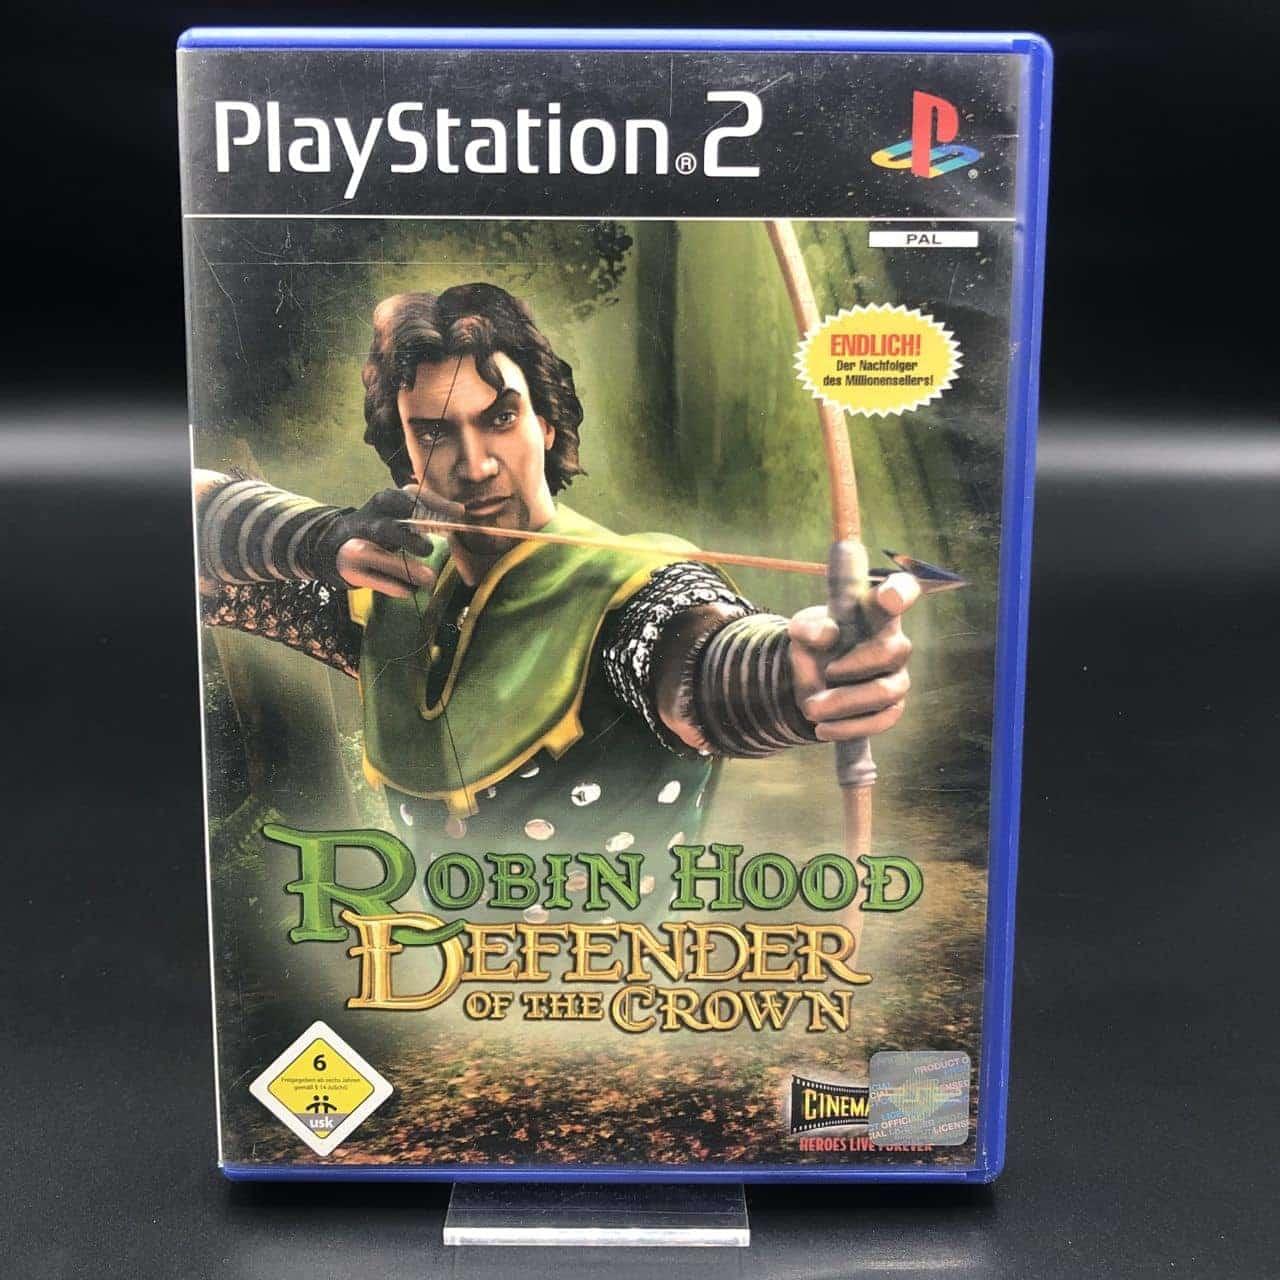 PS2 Robin Hood: Defender of the Crown (Komplett) (Gebrauchsspuren) Sony PlayStation 2